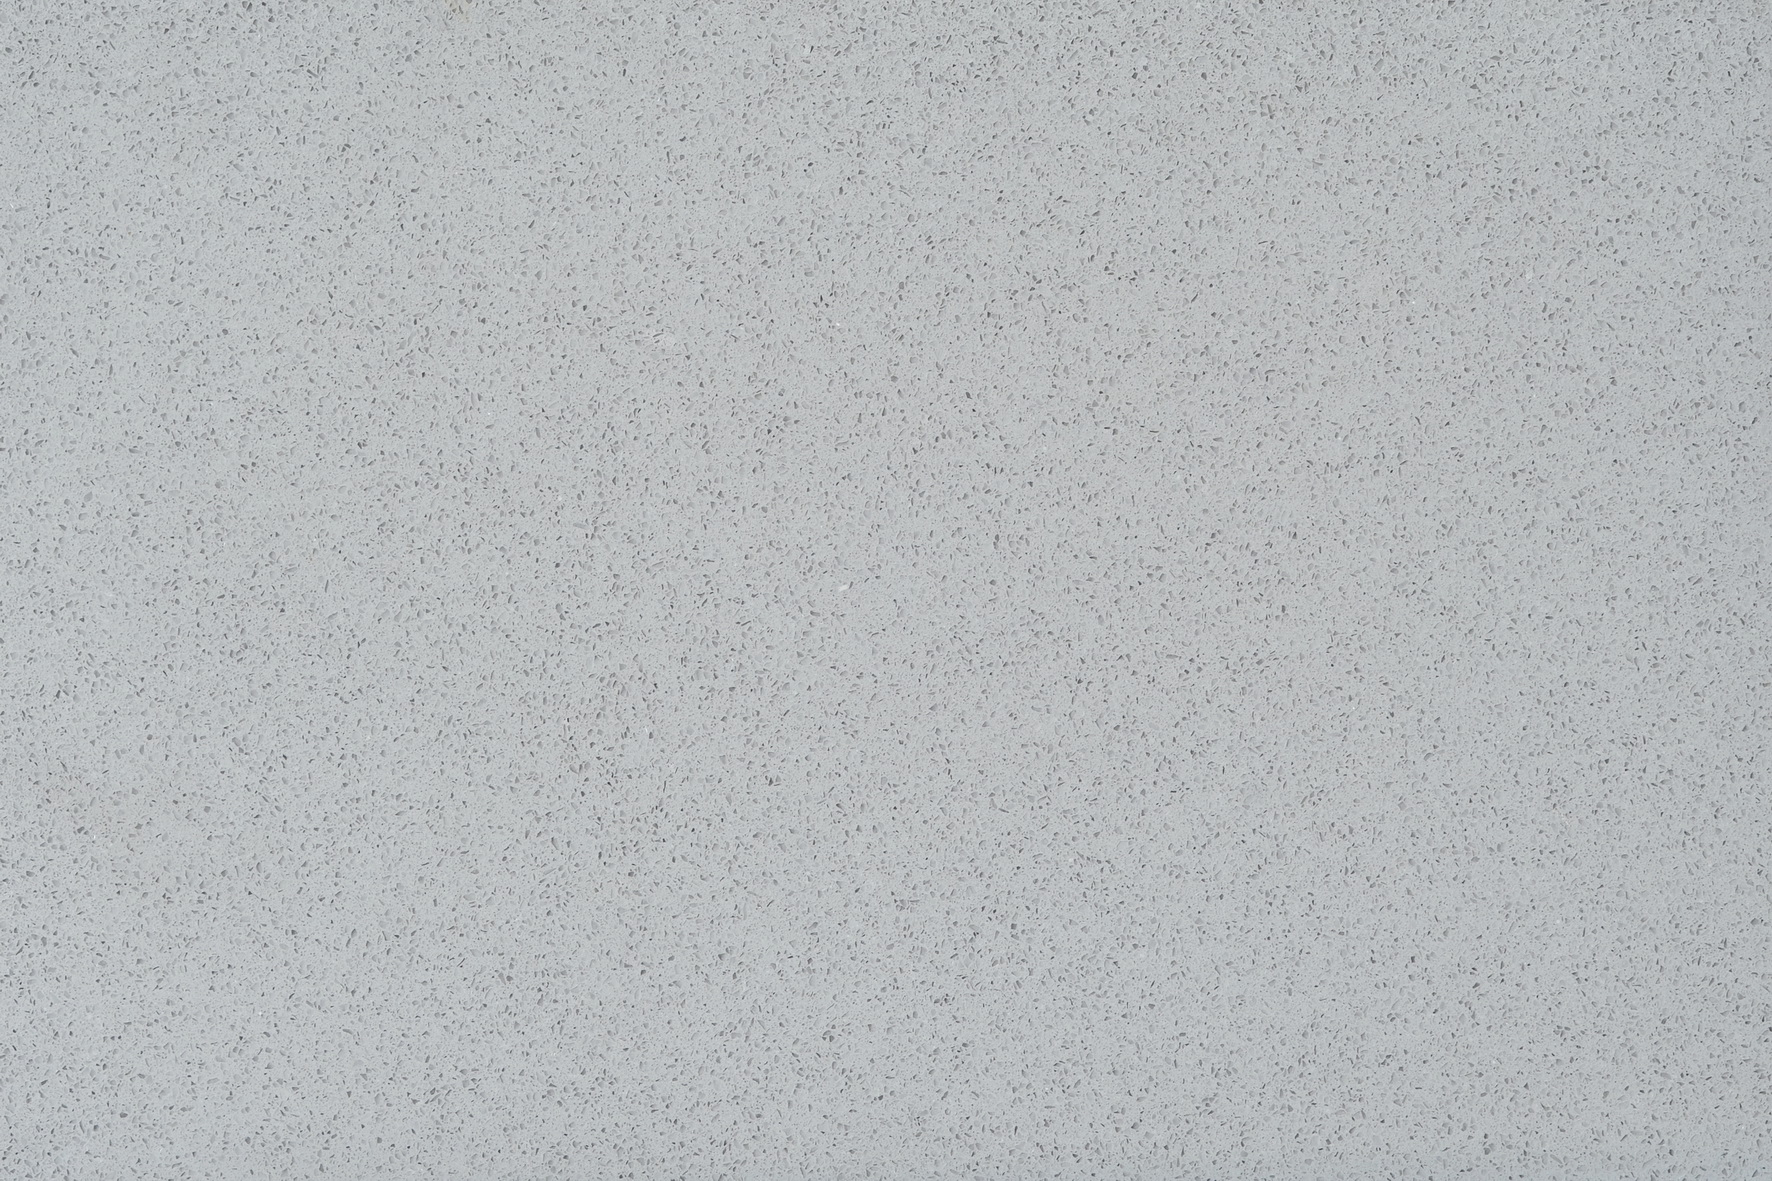 MILAN GREY UNIPLUS BUSH HAMMERED Foto: 1_50252_37702.jpg